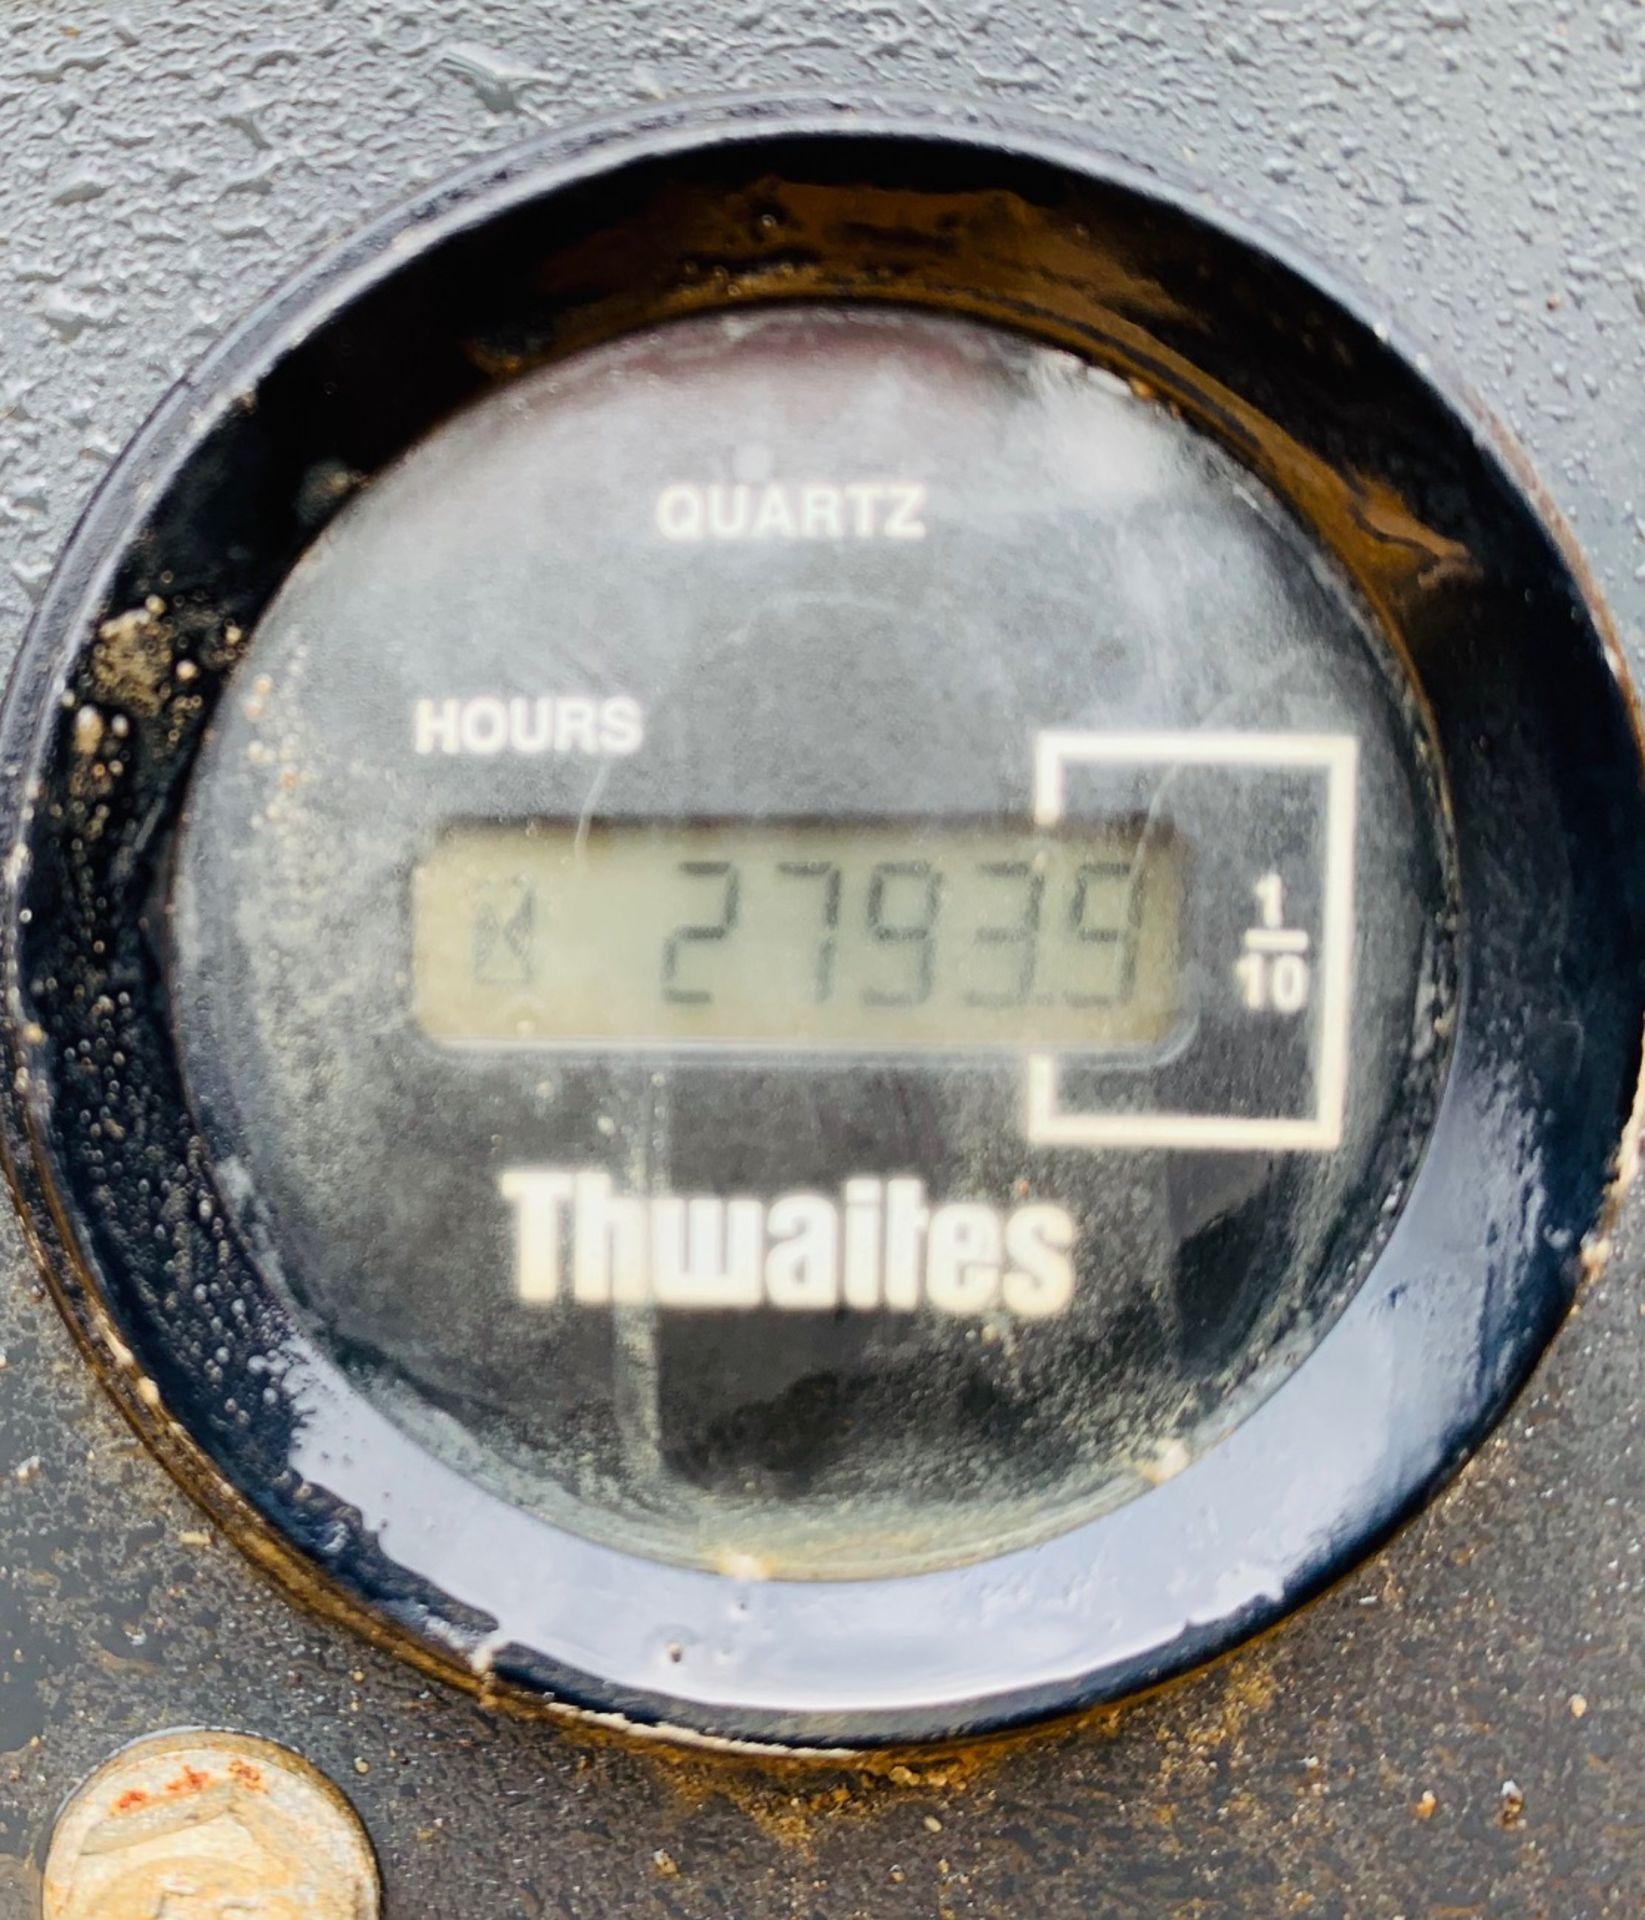 Lot 58 - THWAITES 6 TONNE STRAIGHT TIP DUMPER, YEAR 2008, 2794 HOURS, ORANGE & GREEN BEACONS, CE MARKED